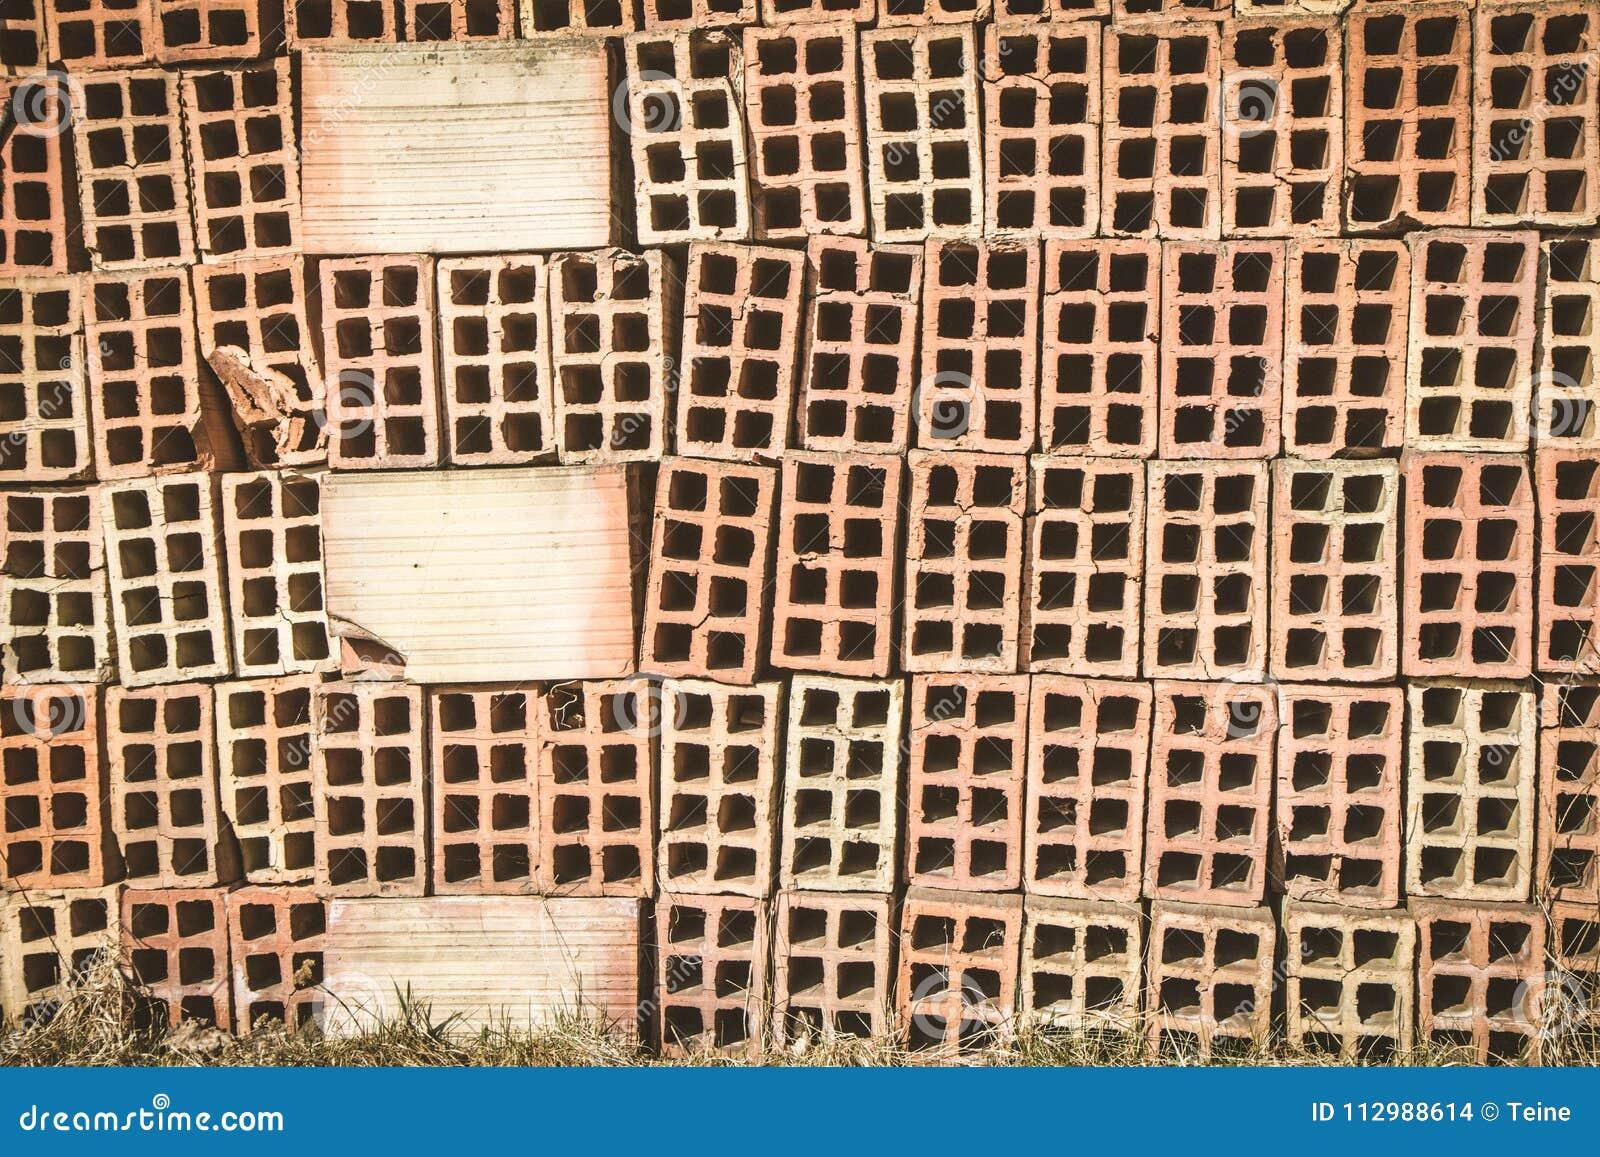 Load of bricks